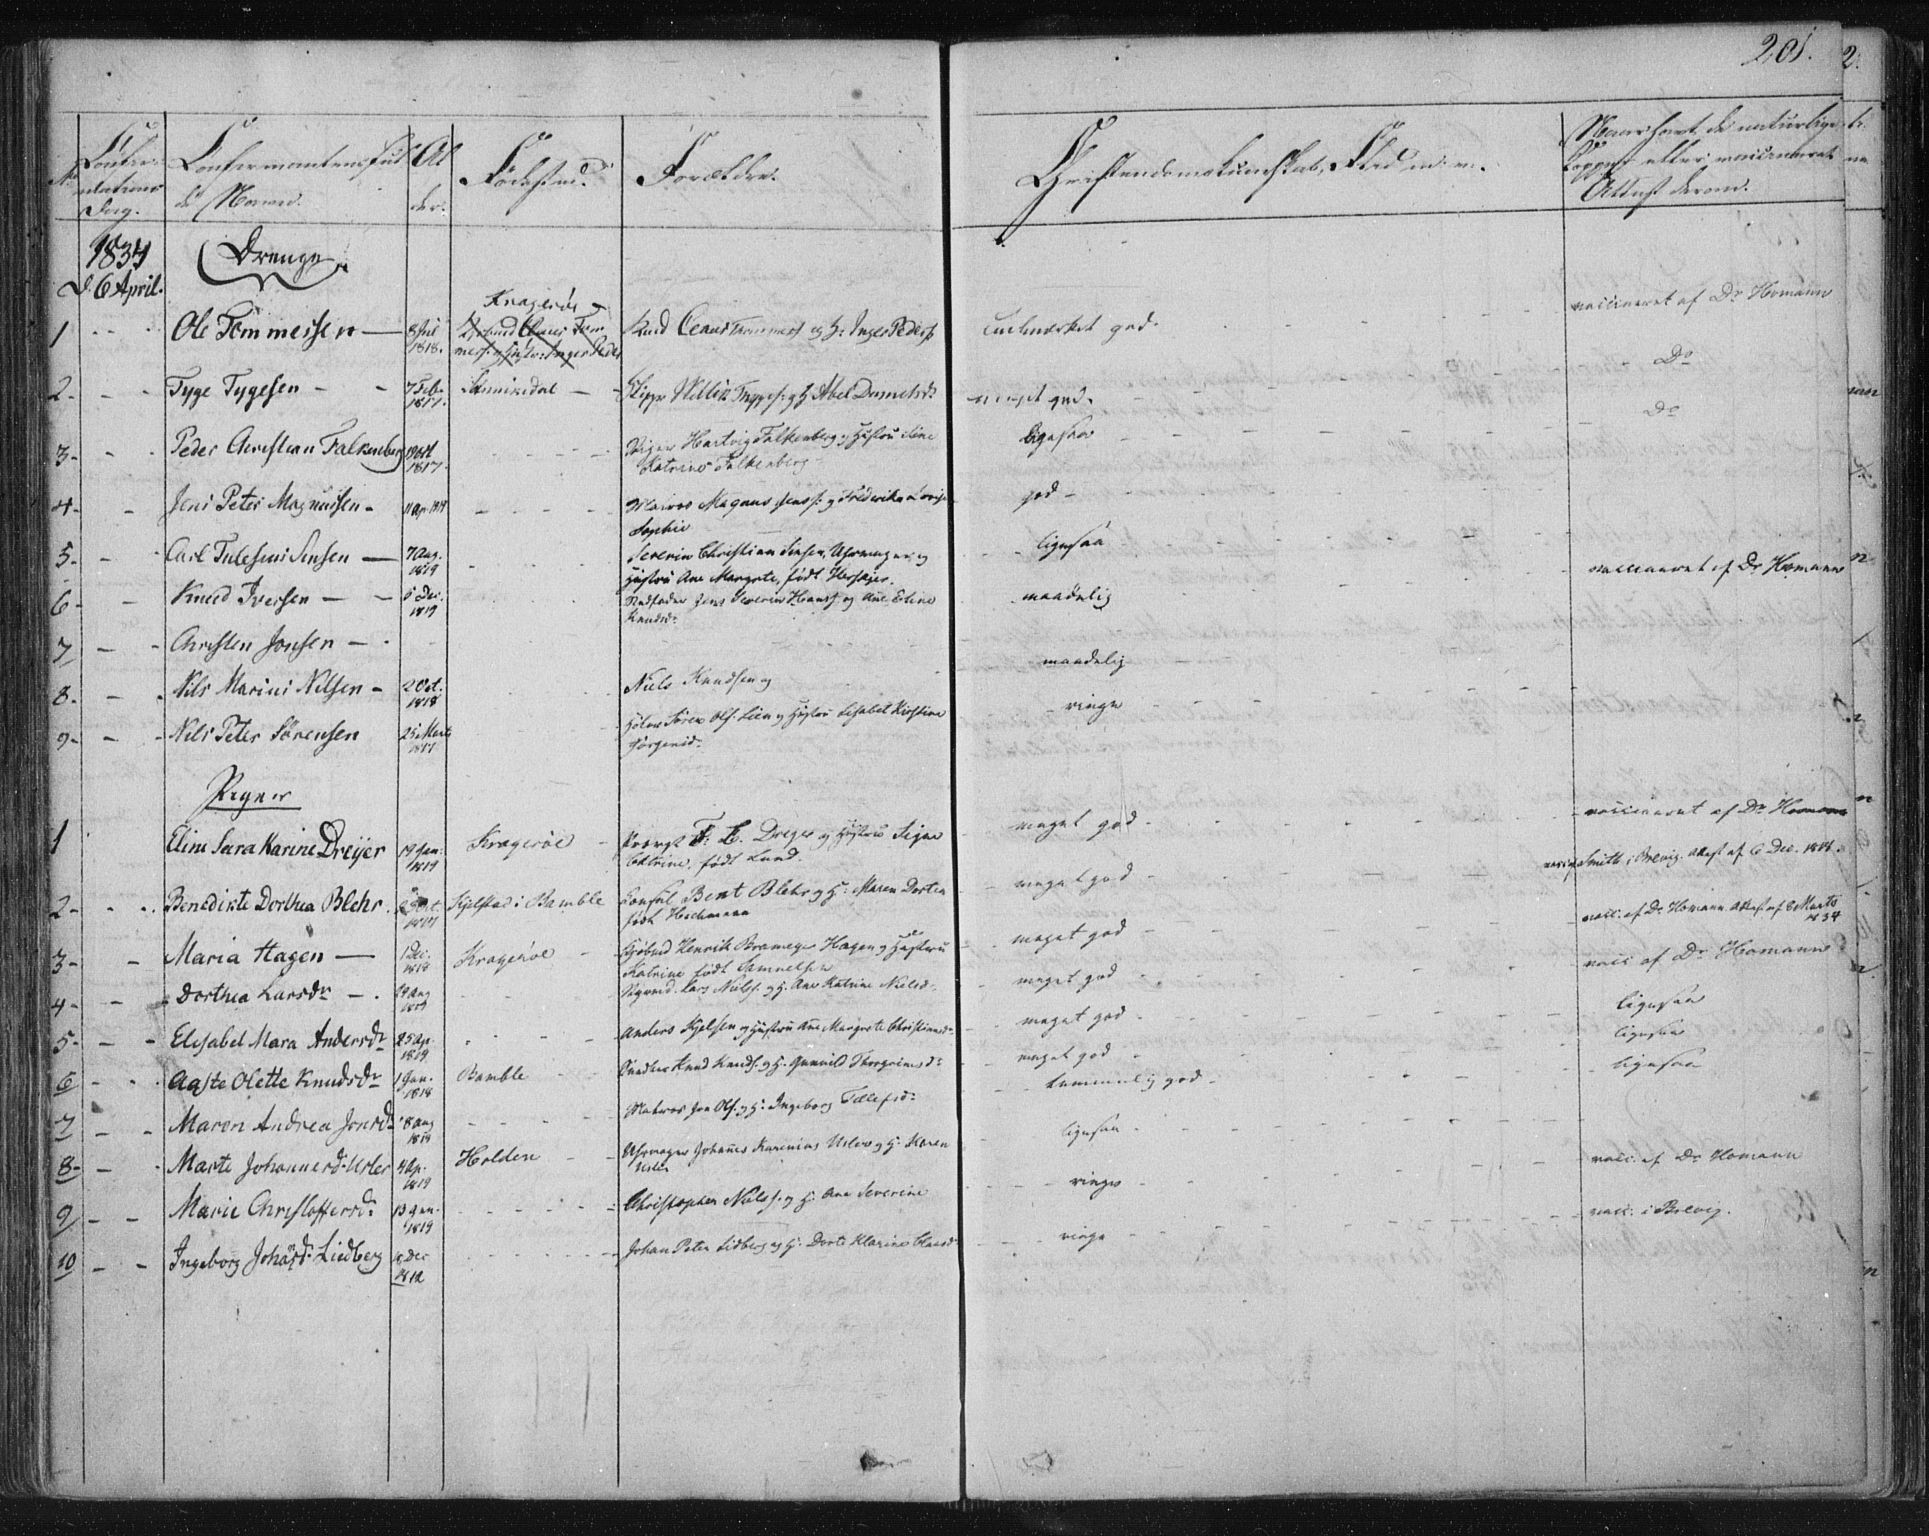 SAKO, Kragerø kirkebøker, F/Fa/L0005: Ministerialbok nr. 5, 1832-1847, s. 201